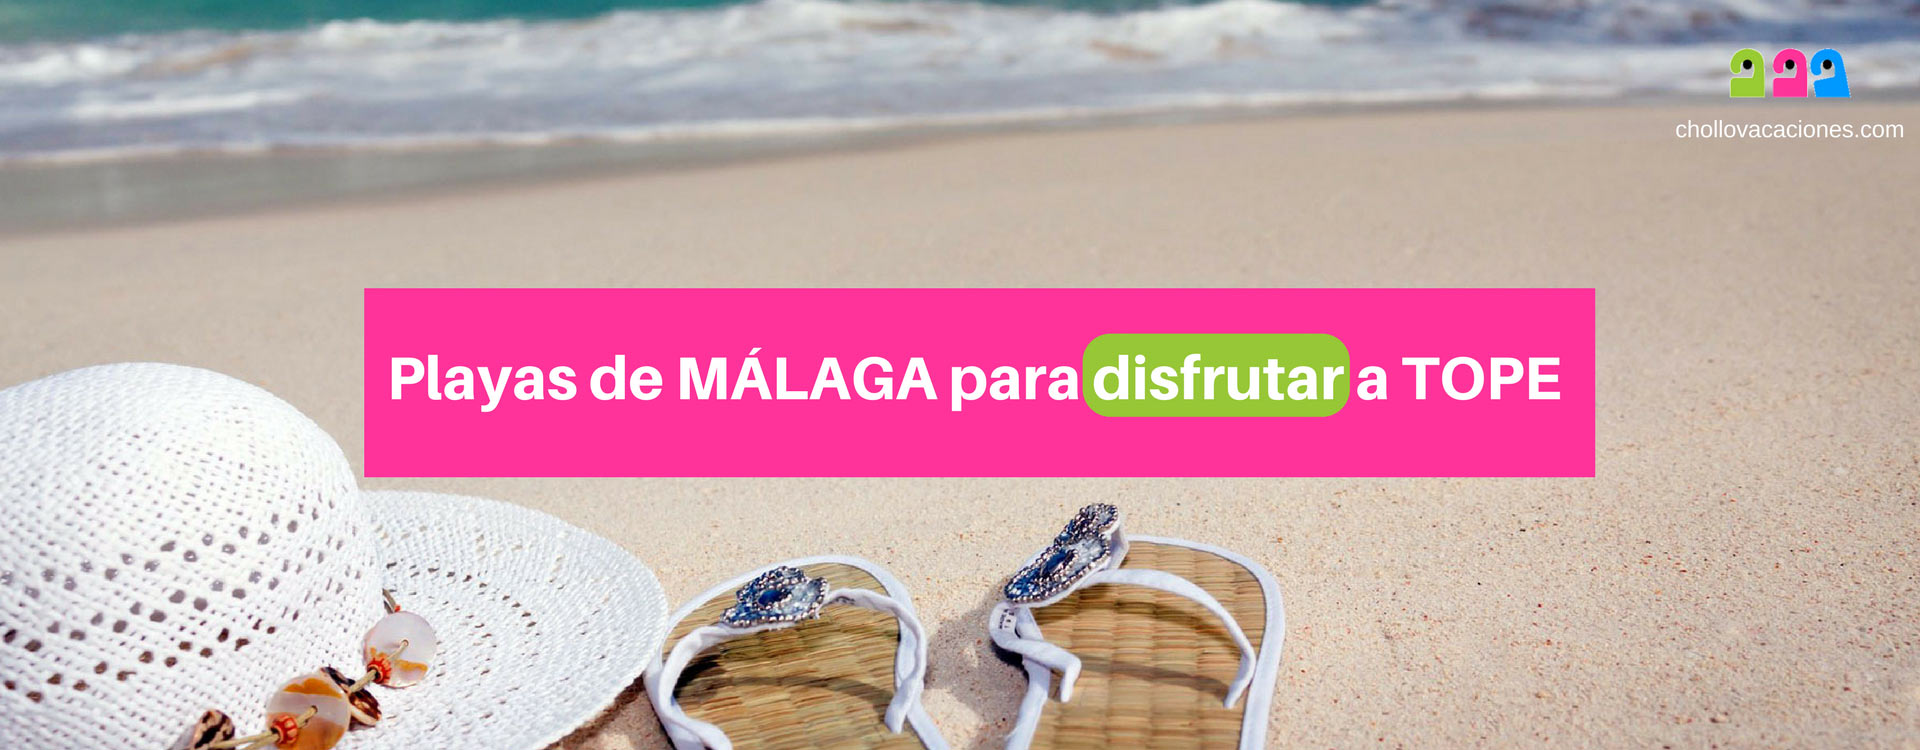 Playas de Málaga para disfrutar a tope